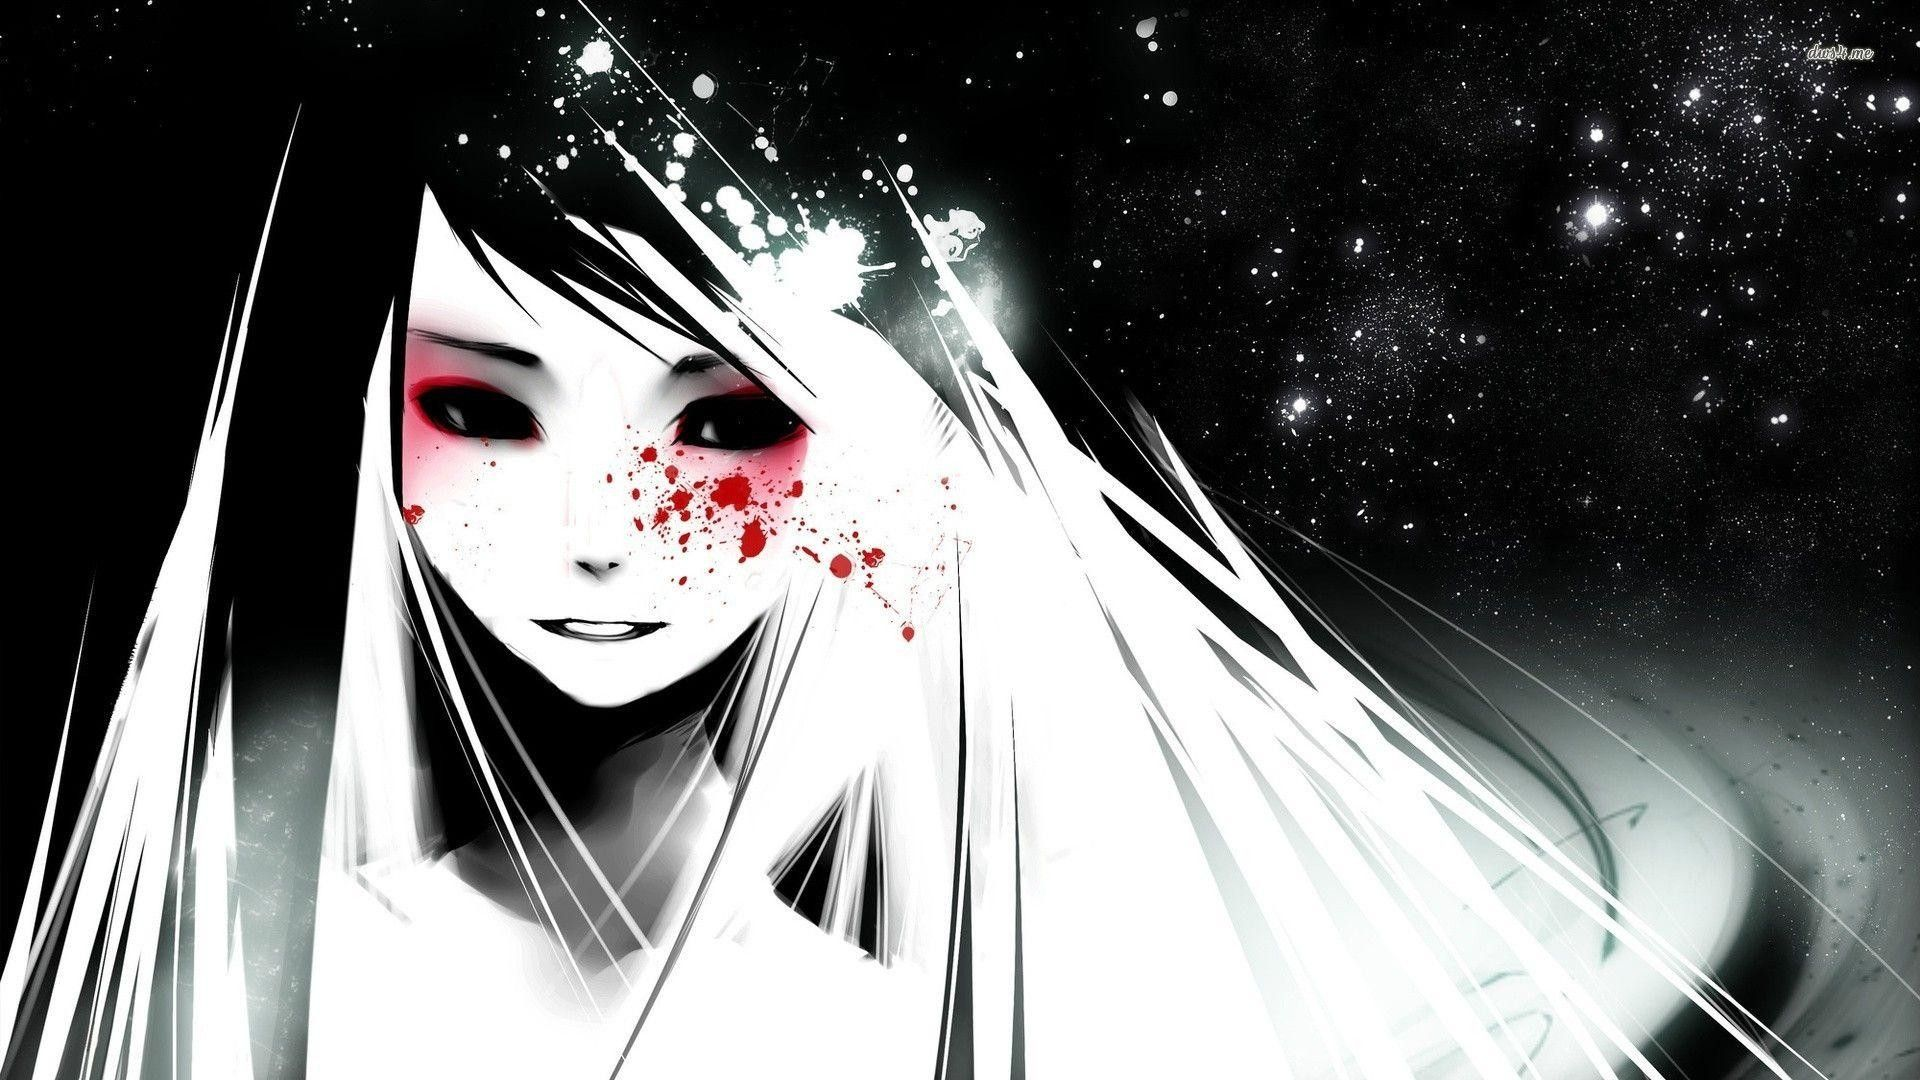 Dark Anime Girl Wallpapers Top Free Dark Anime Girl Backgrounds Wallpaperaccess